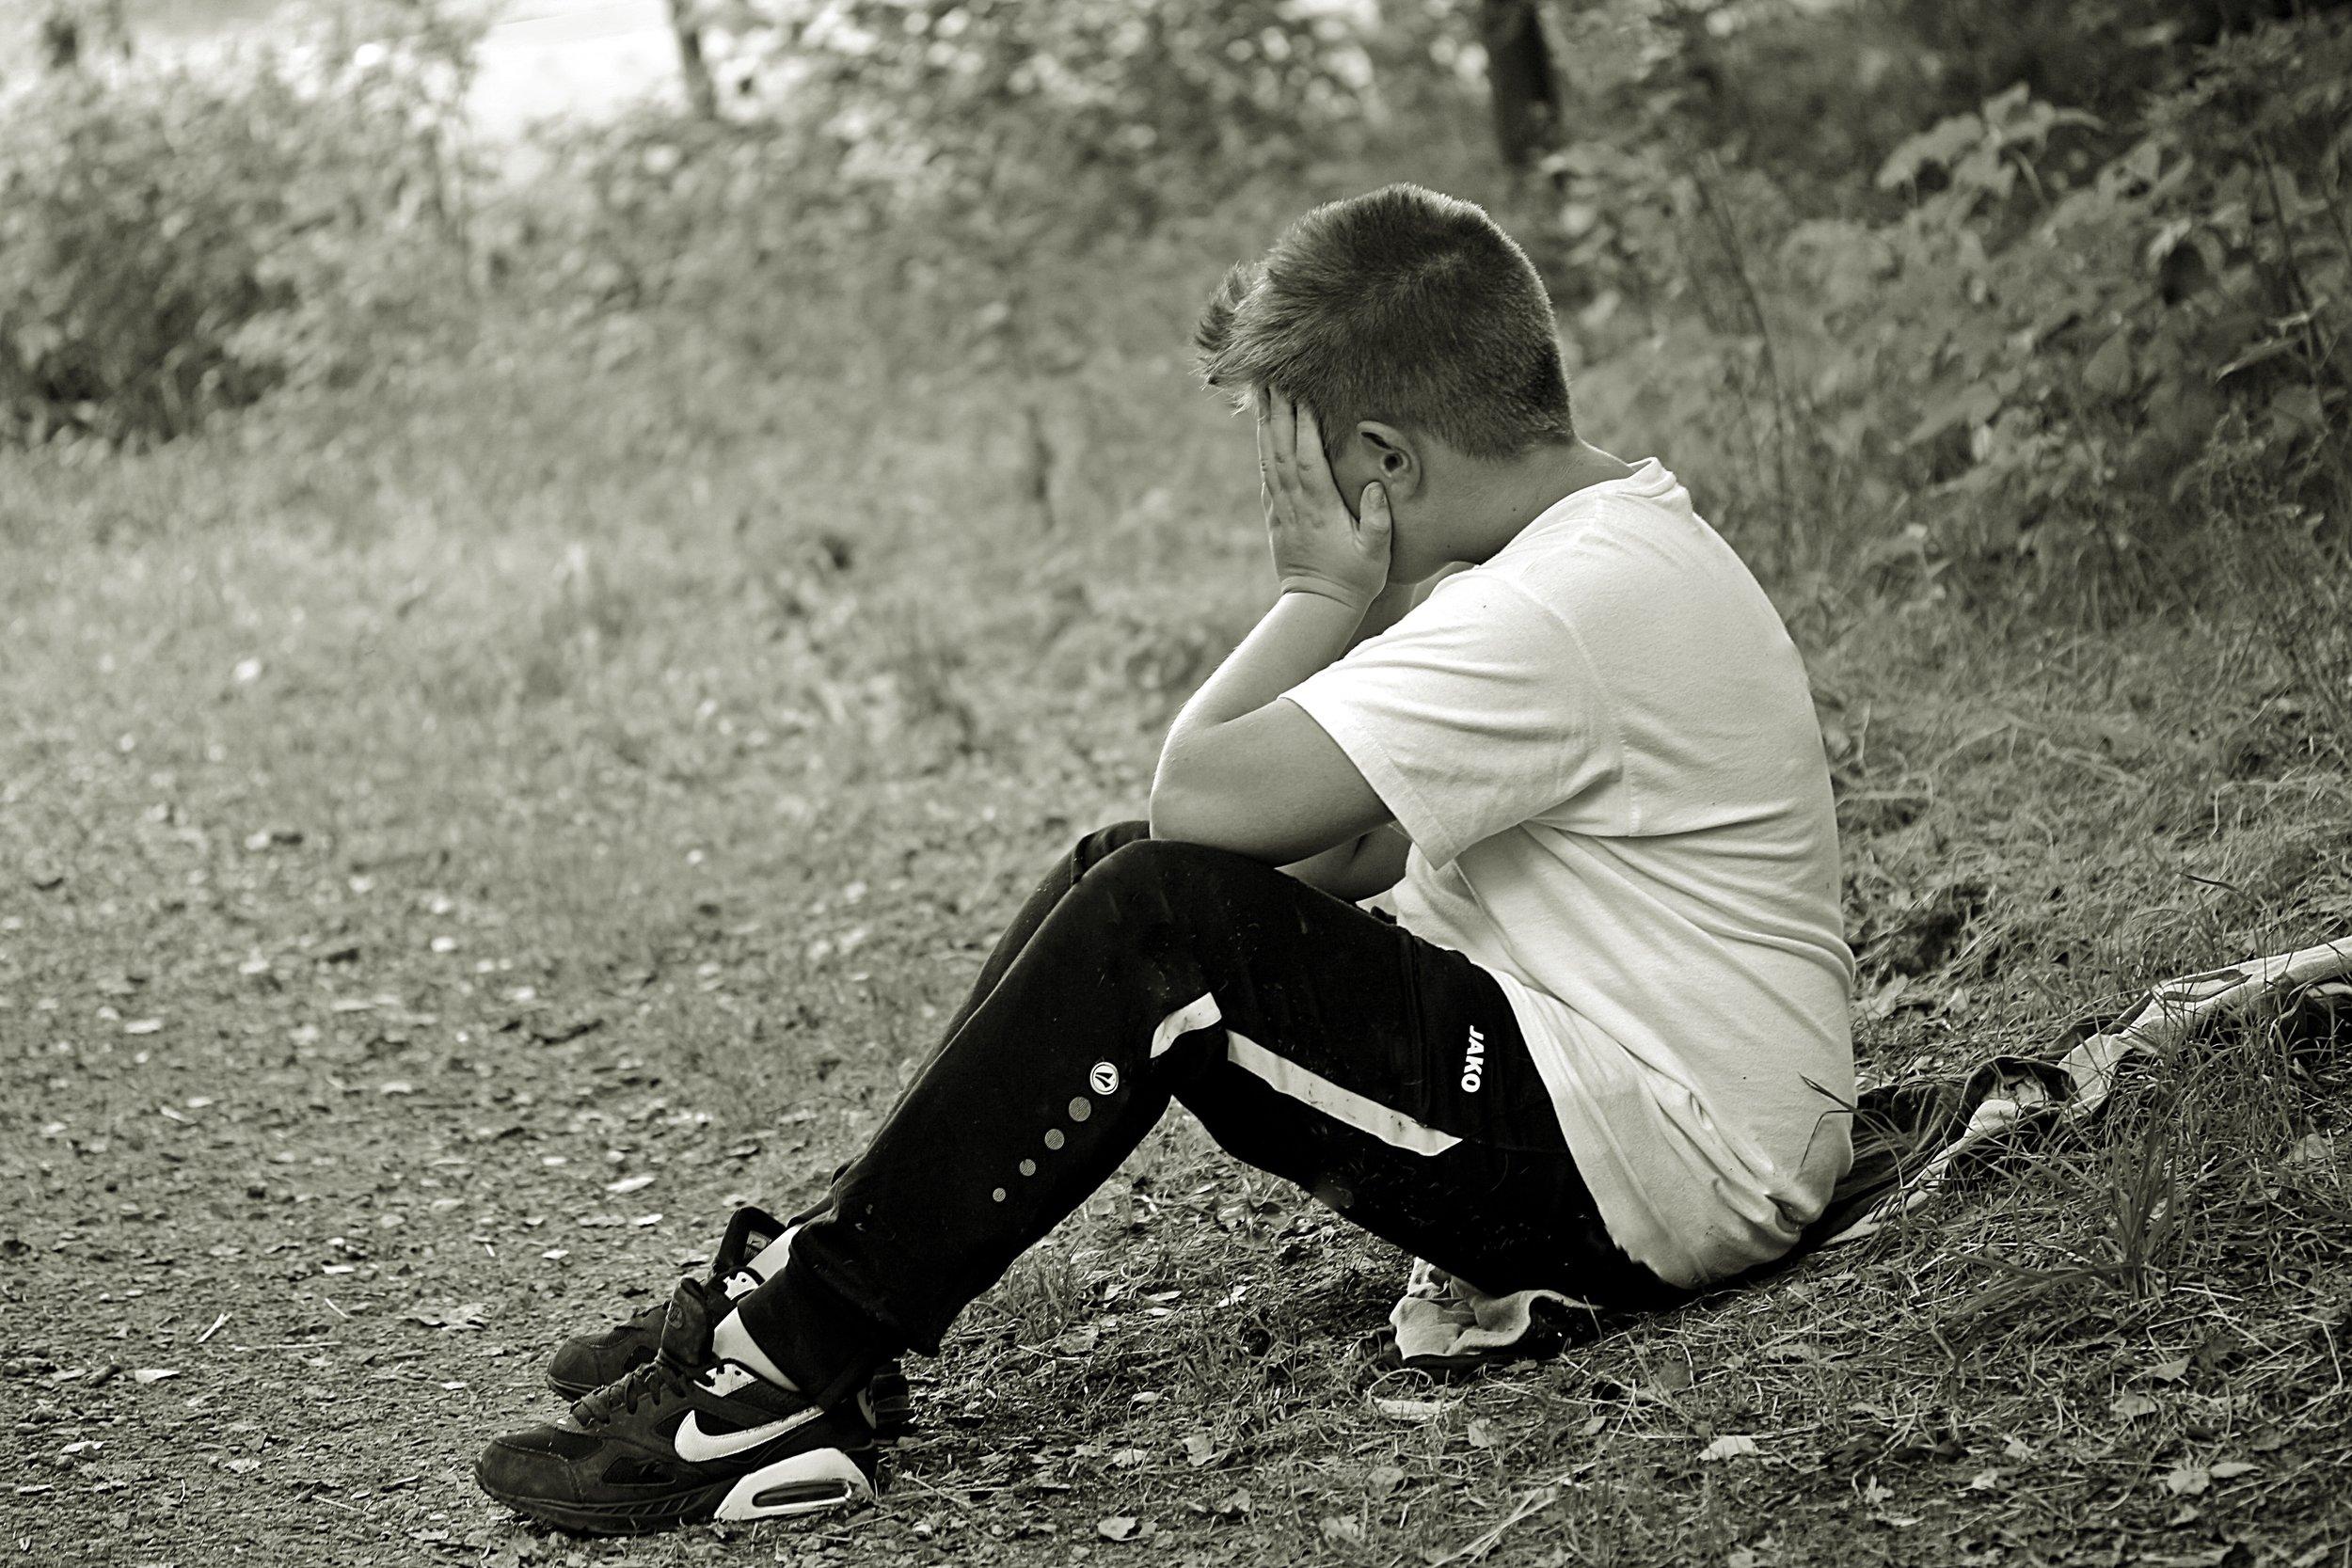 boy-profile-hiding-face-sitting-knees-bent-black-white.jpg